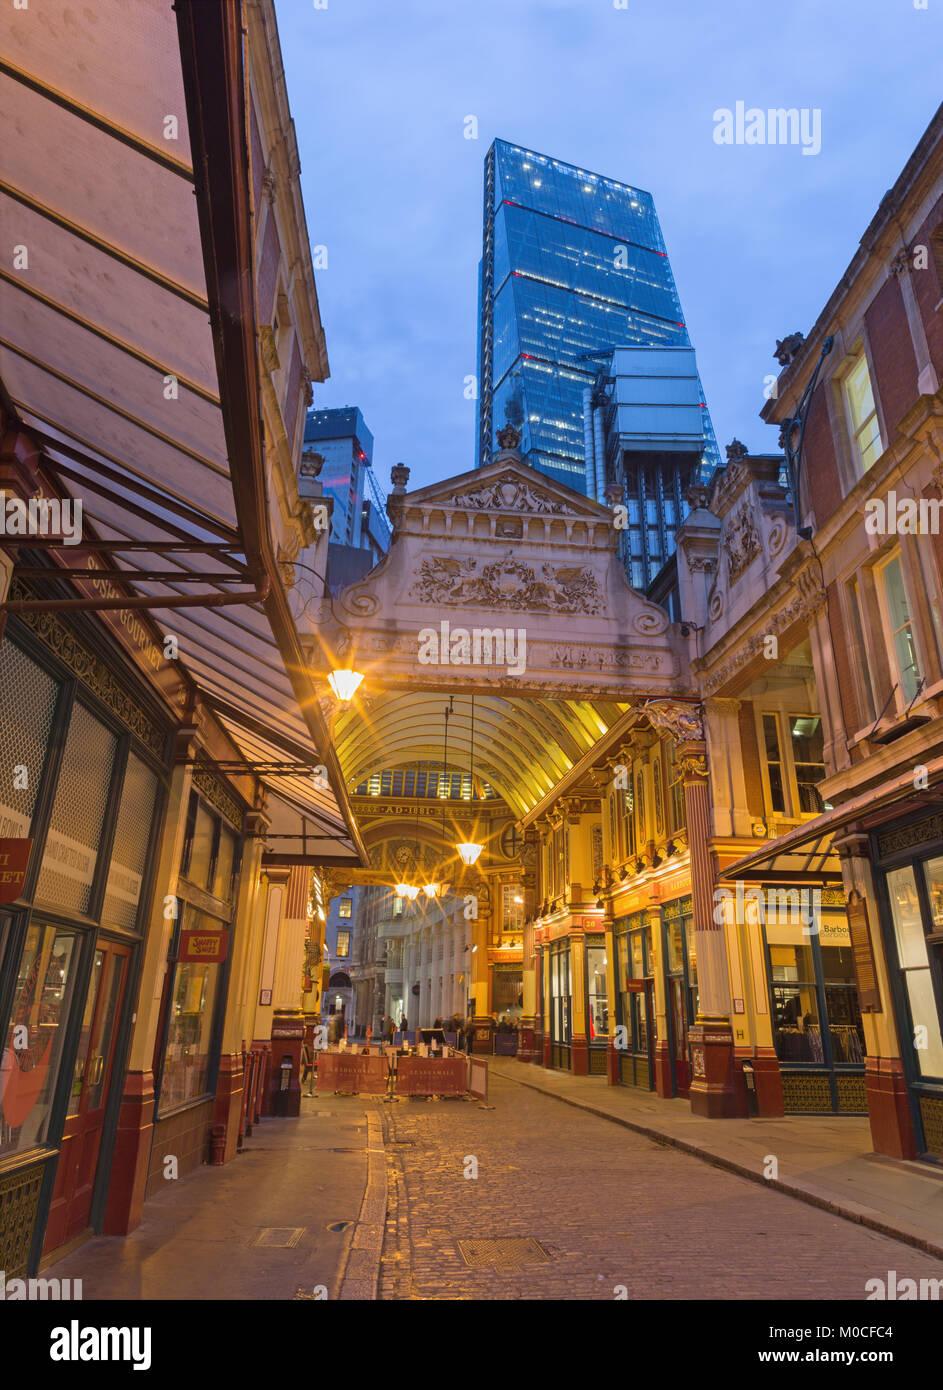 LONDON, GREAT BRITAIN - SEPTEMBER 18, 2017: The Leadenhall market and Leadenhall tower at dusk. - Stock Image